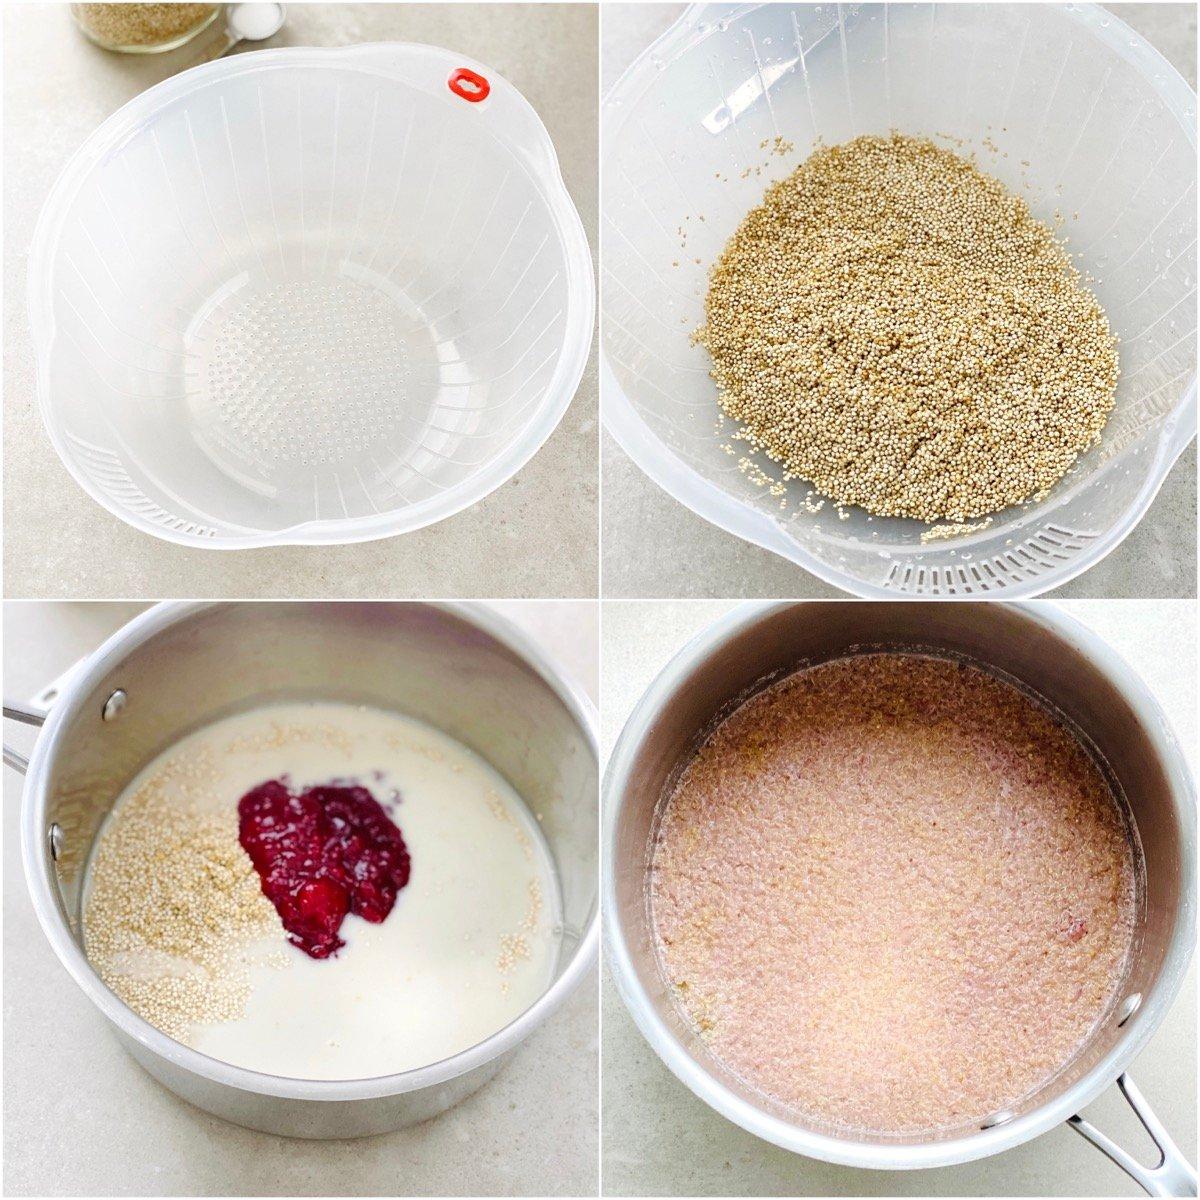 How To Make Strawberries And Cream Quinoa